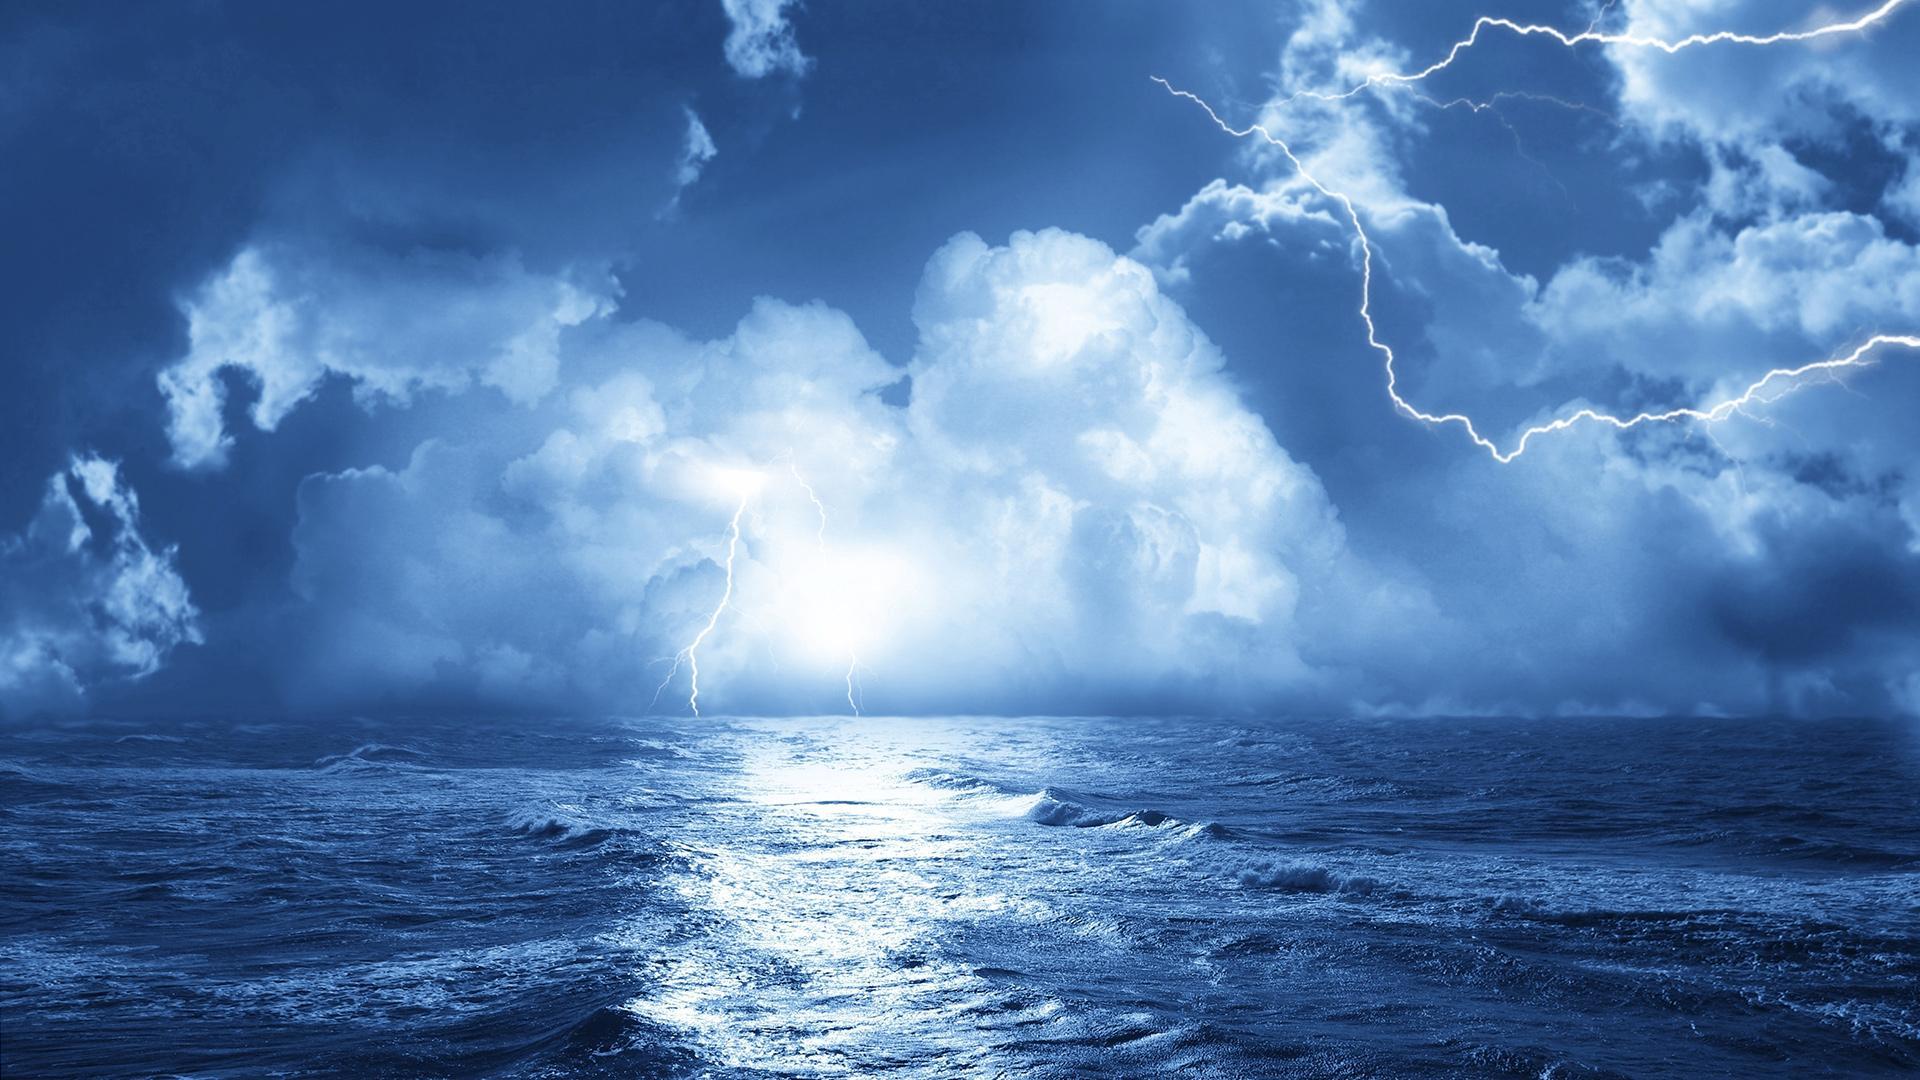 sky wallpaper sea